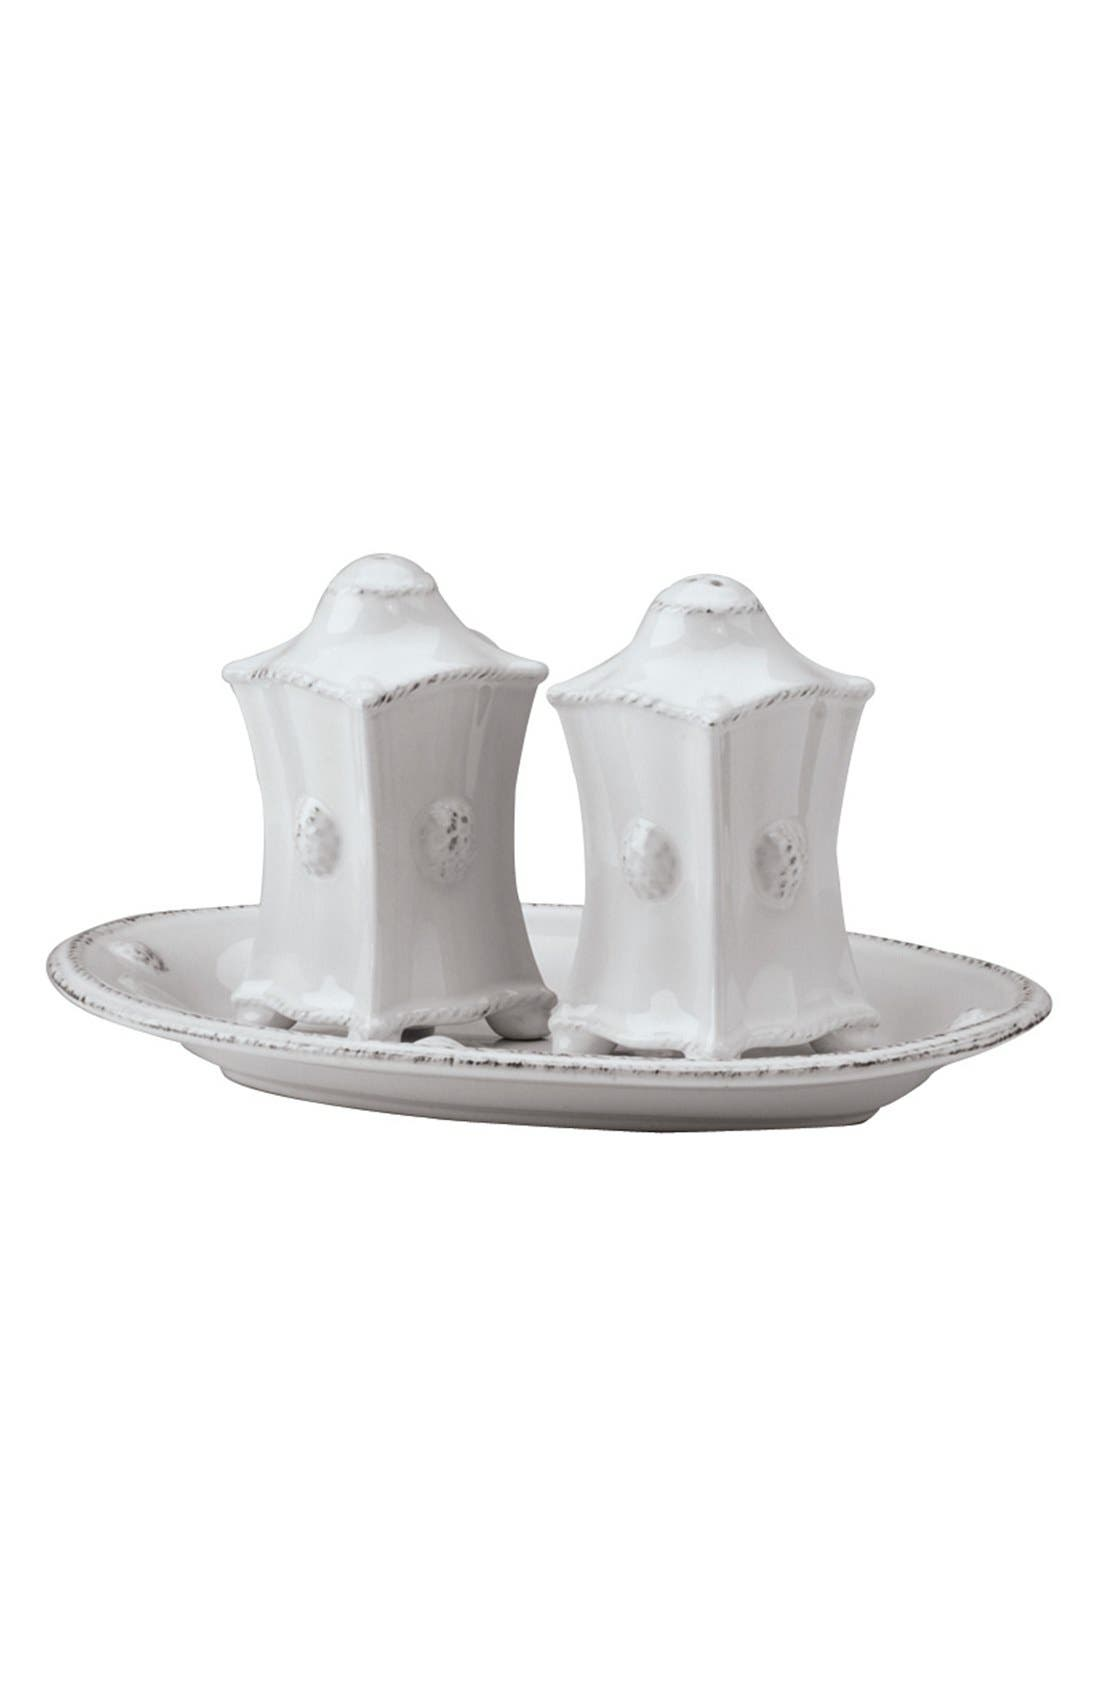 Alternate Image 1 Selected - Juliska'Berry and Thread' CeramicSalt & Pepper Shakers